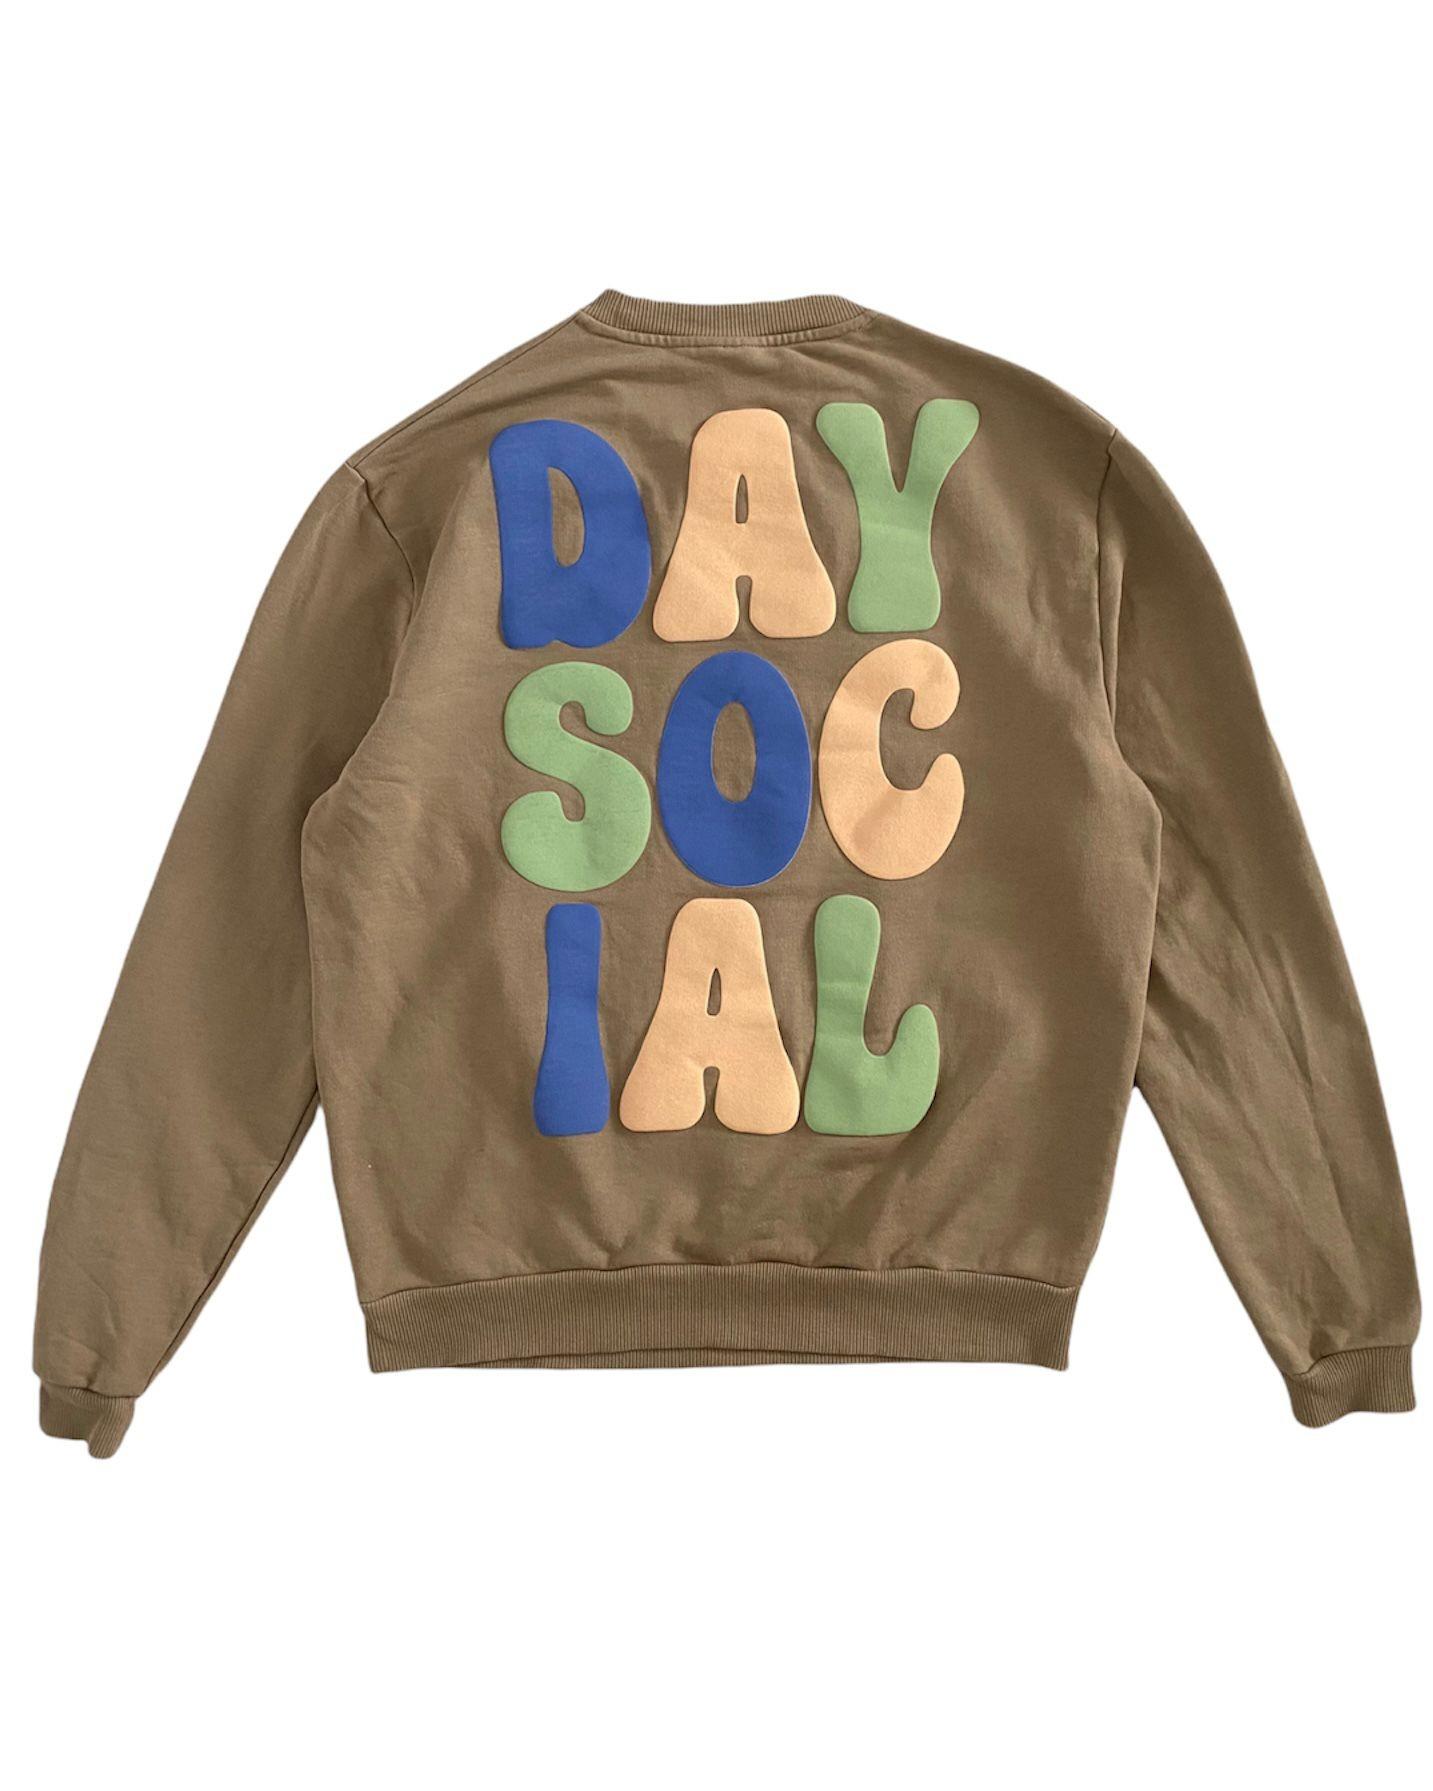 A. Design Day Social Sweatshirt (SAS79)